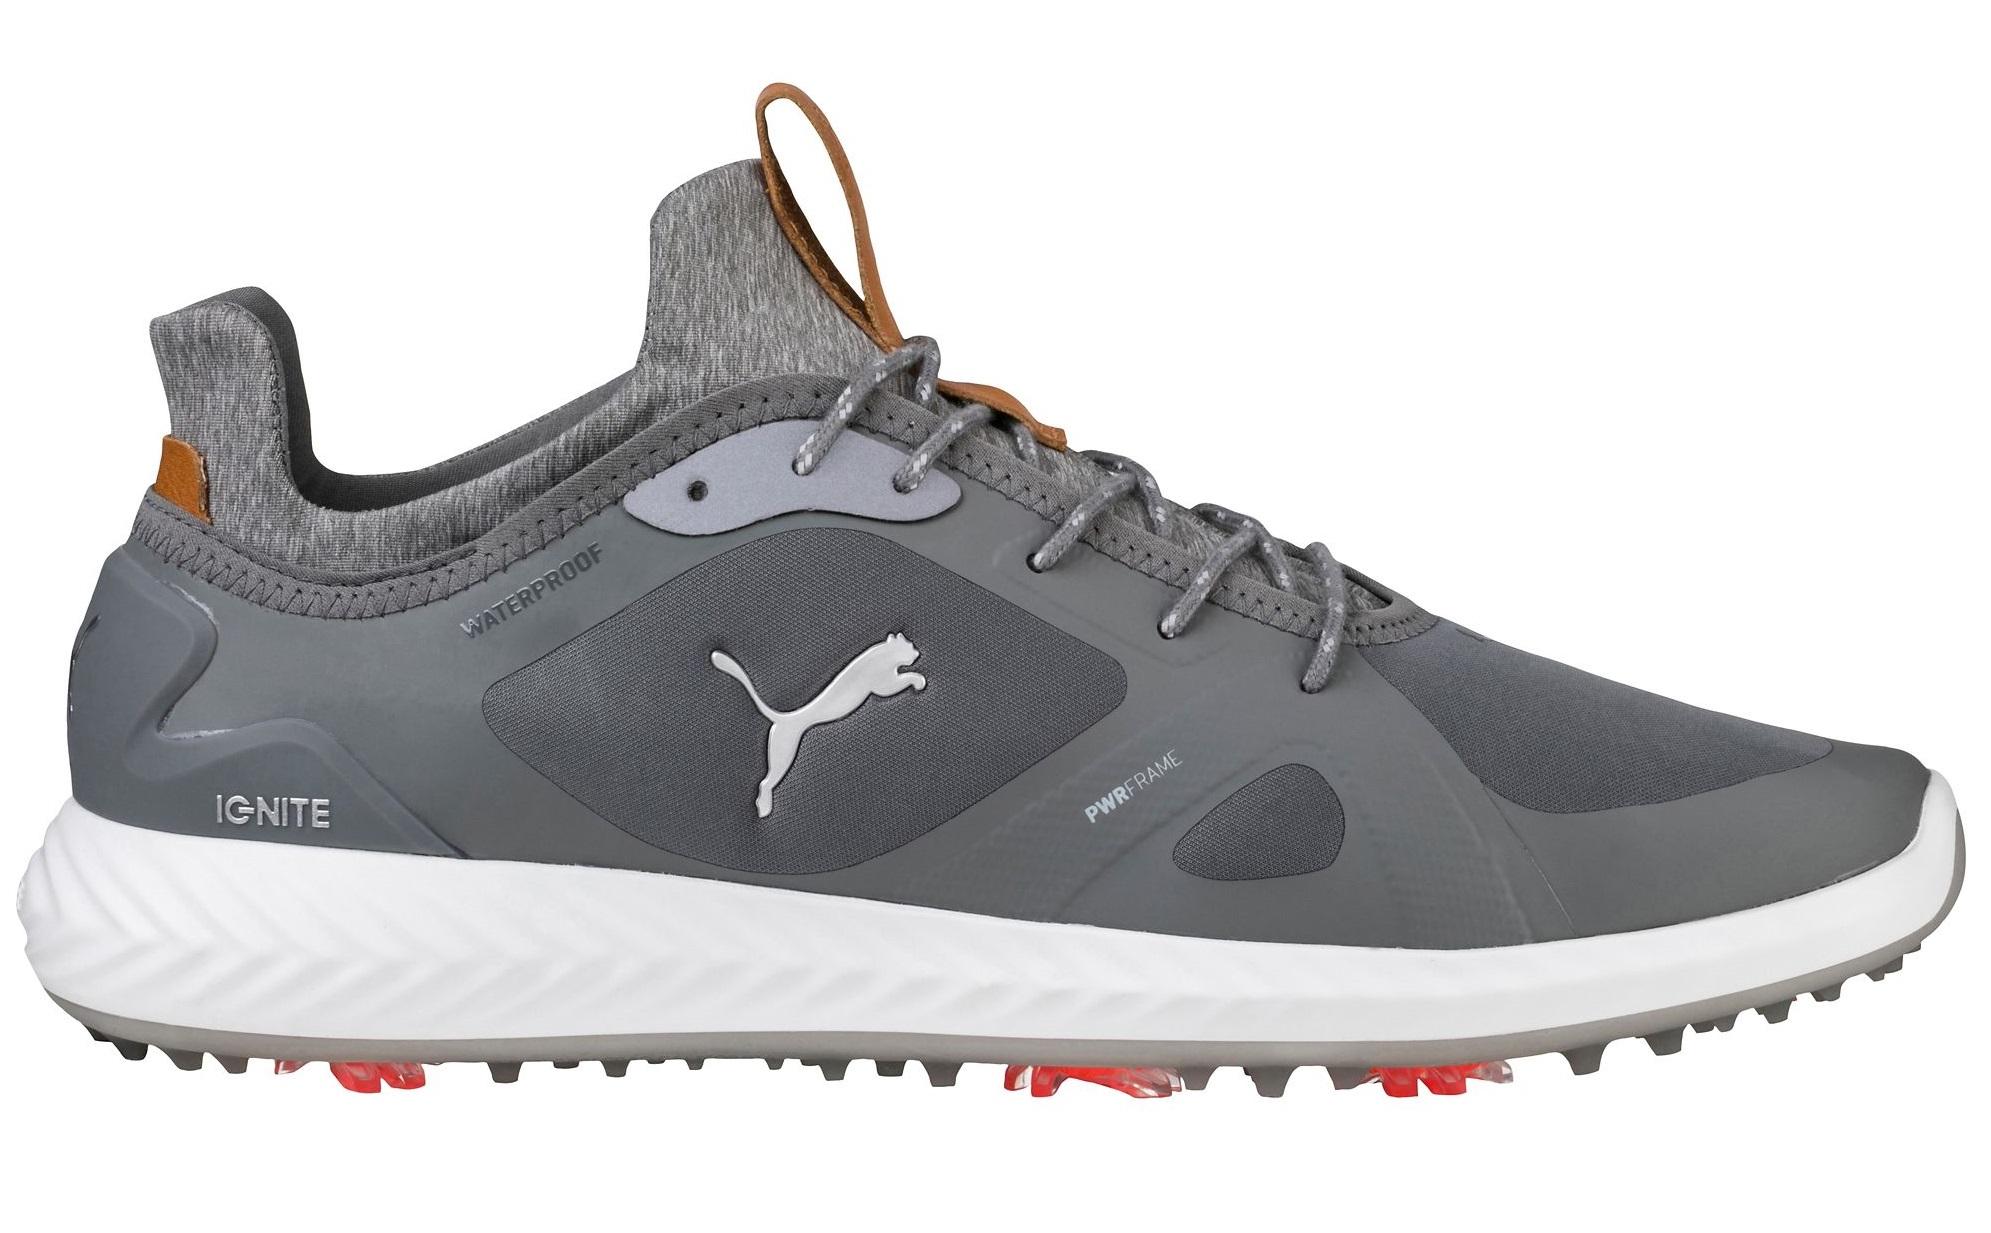 puma golf ignite power adapt